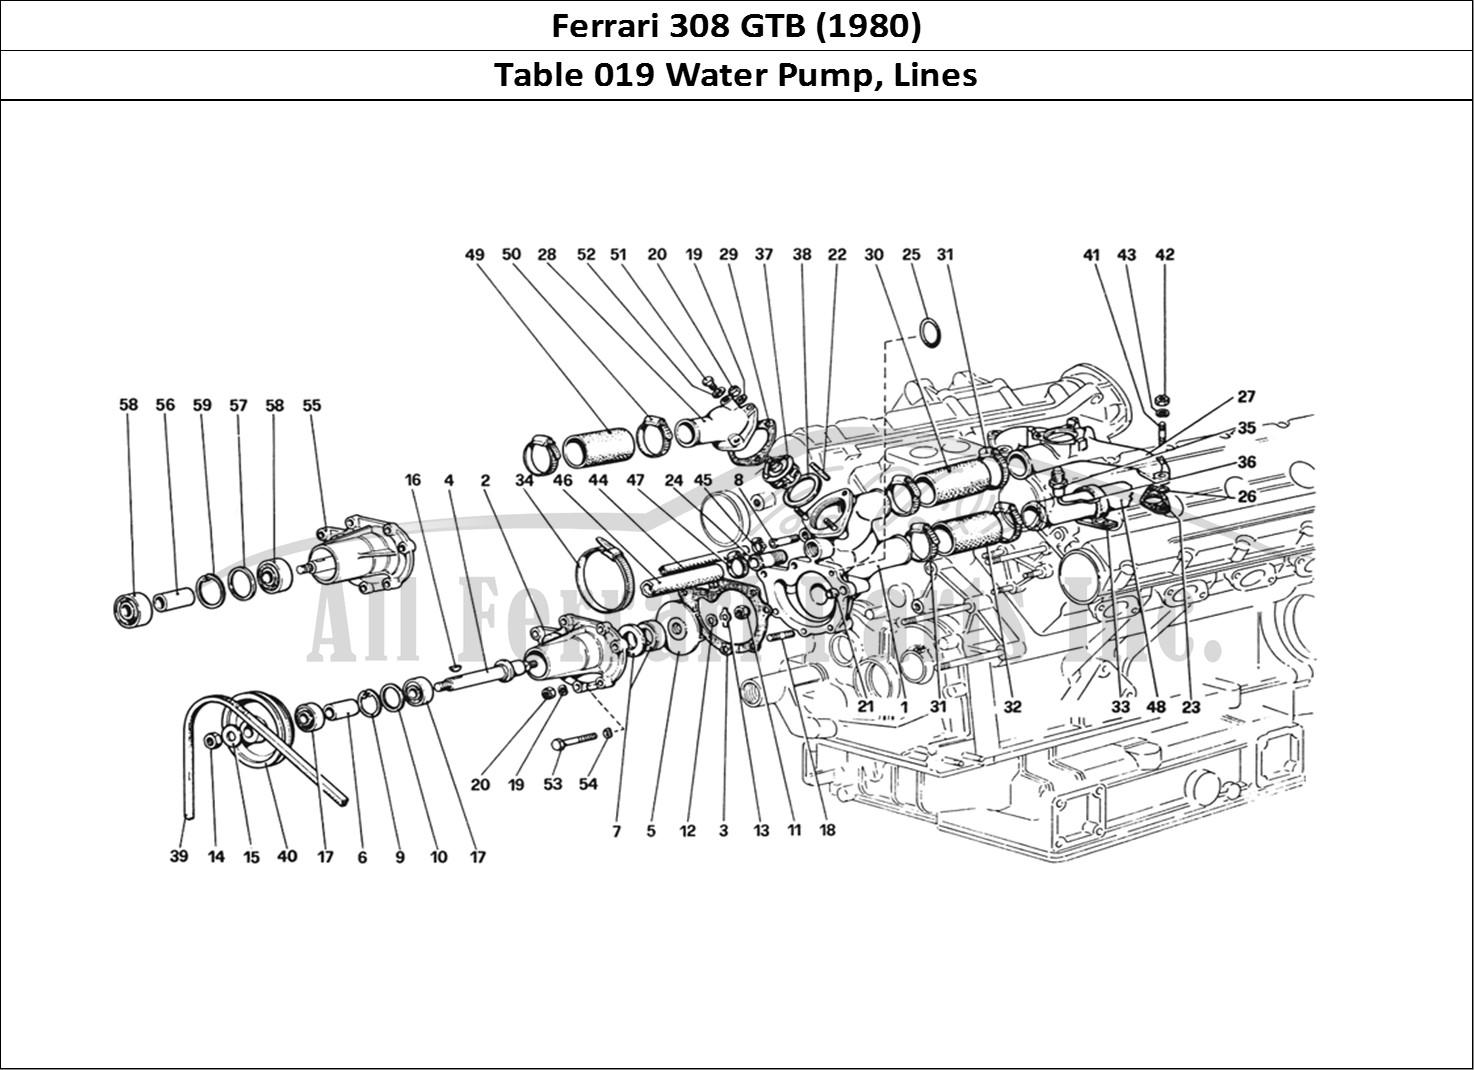 Buy original Ferrari 308 GTB (1980) 019 Water Pump, Lines